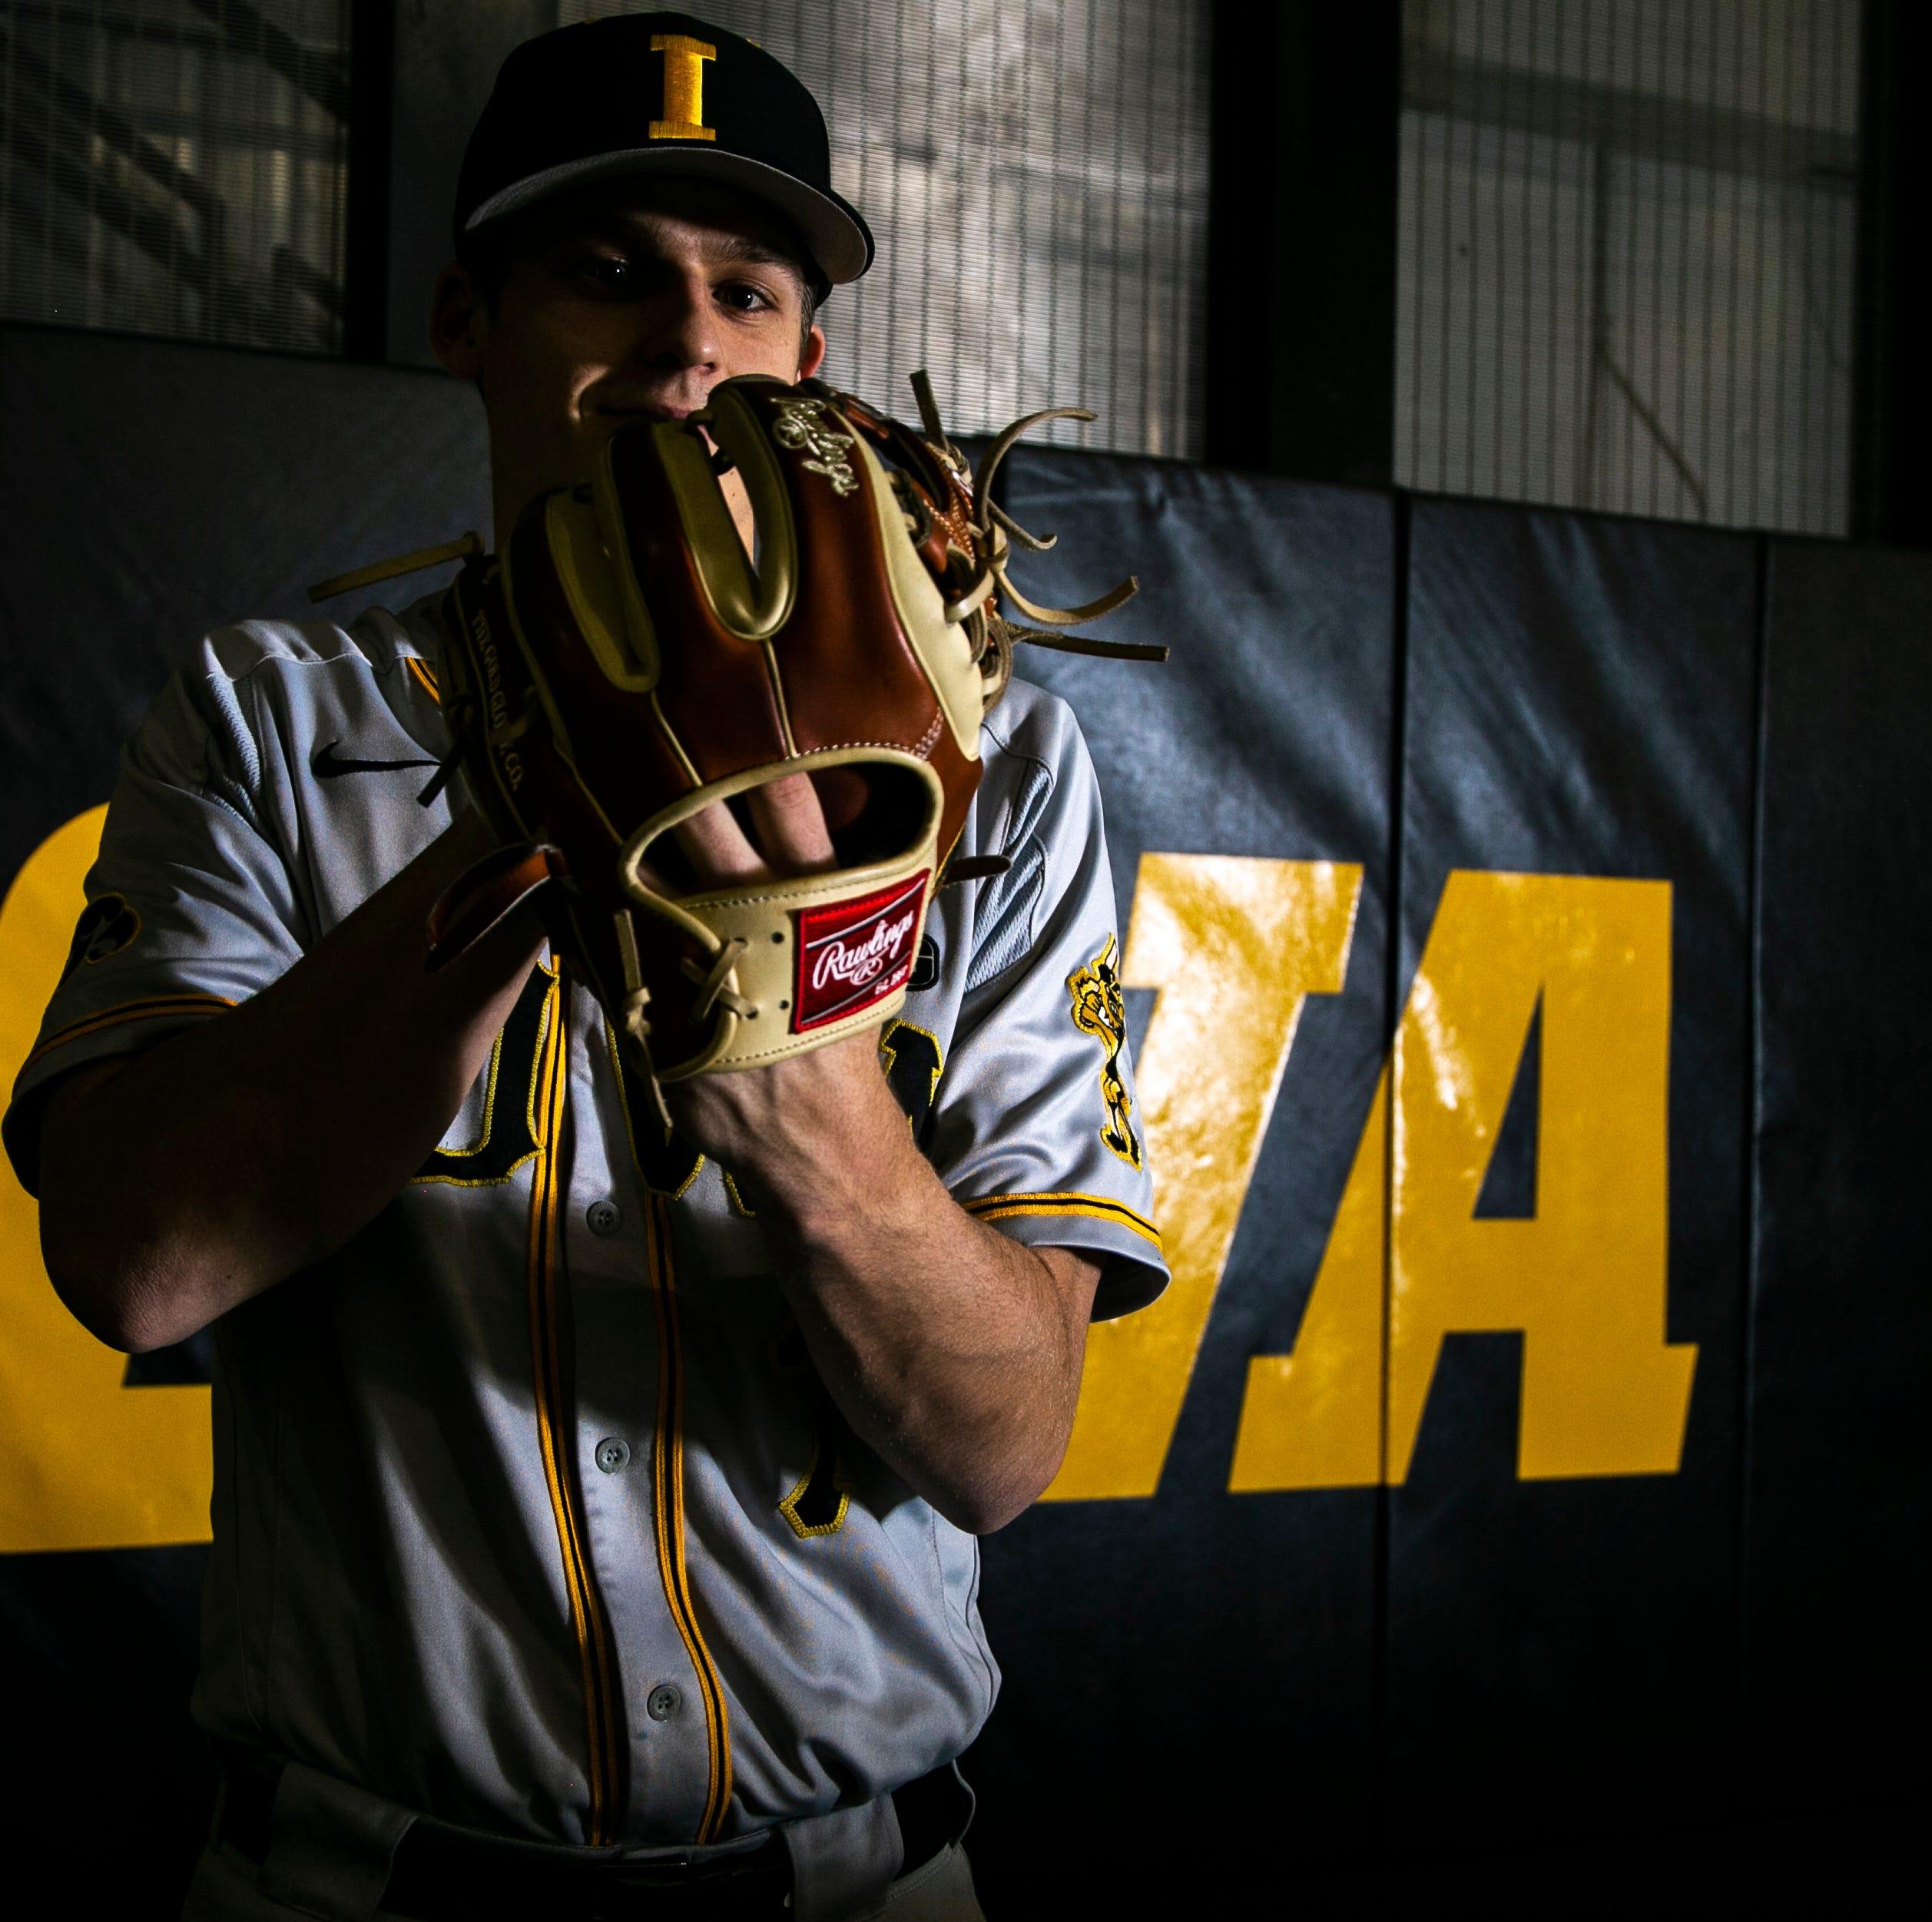 Iowa baseball: Grant Judkins' six no-hit innings propel Hawkeyes past Marshall